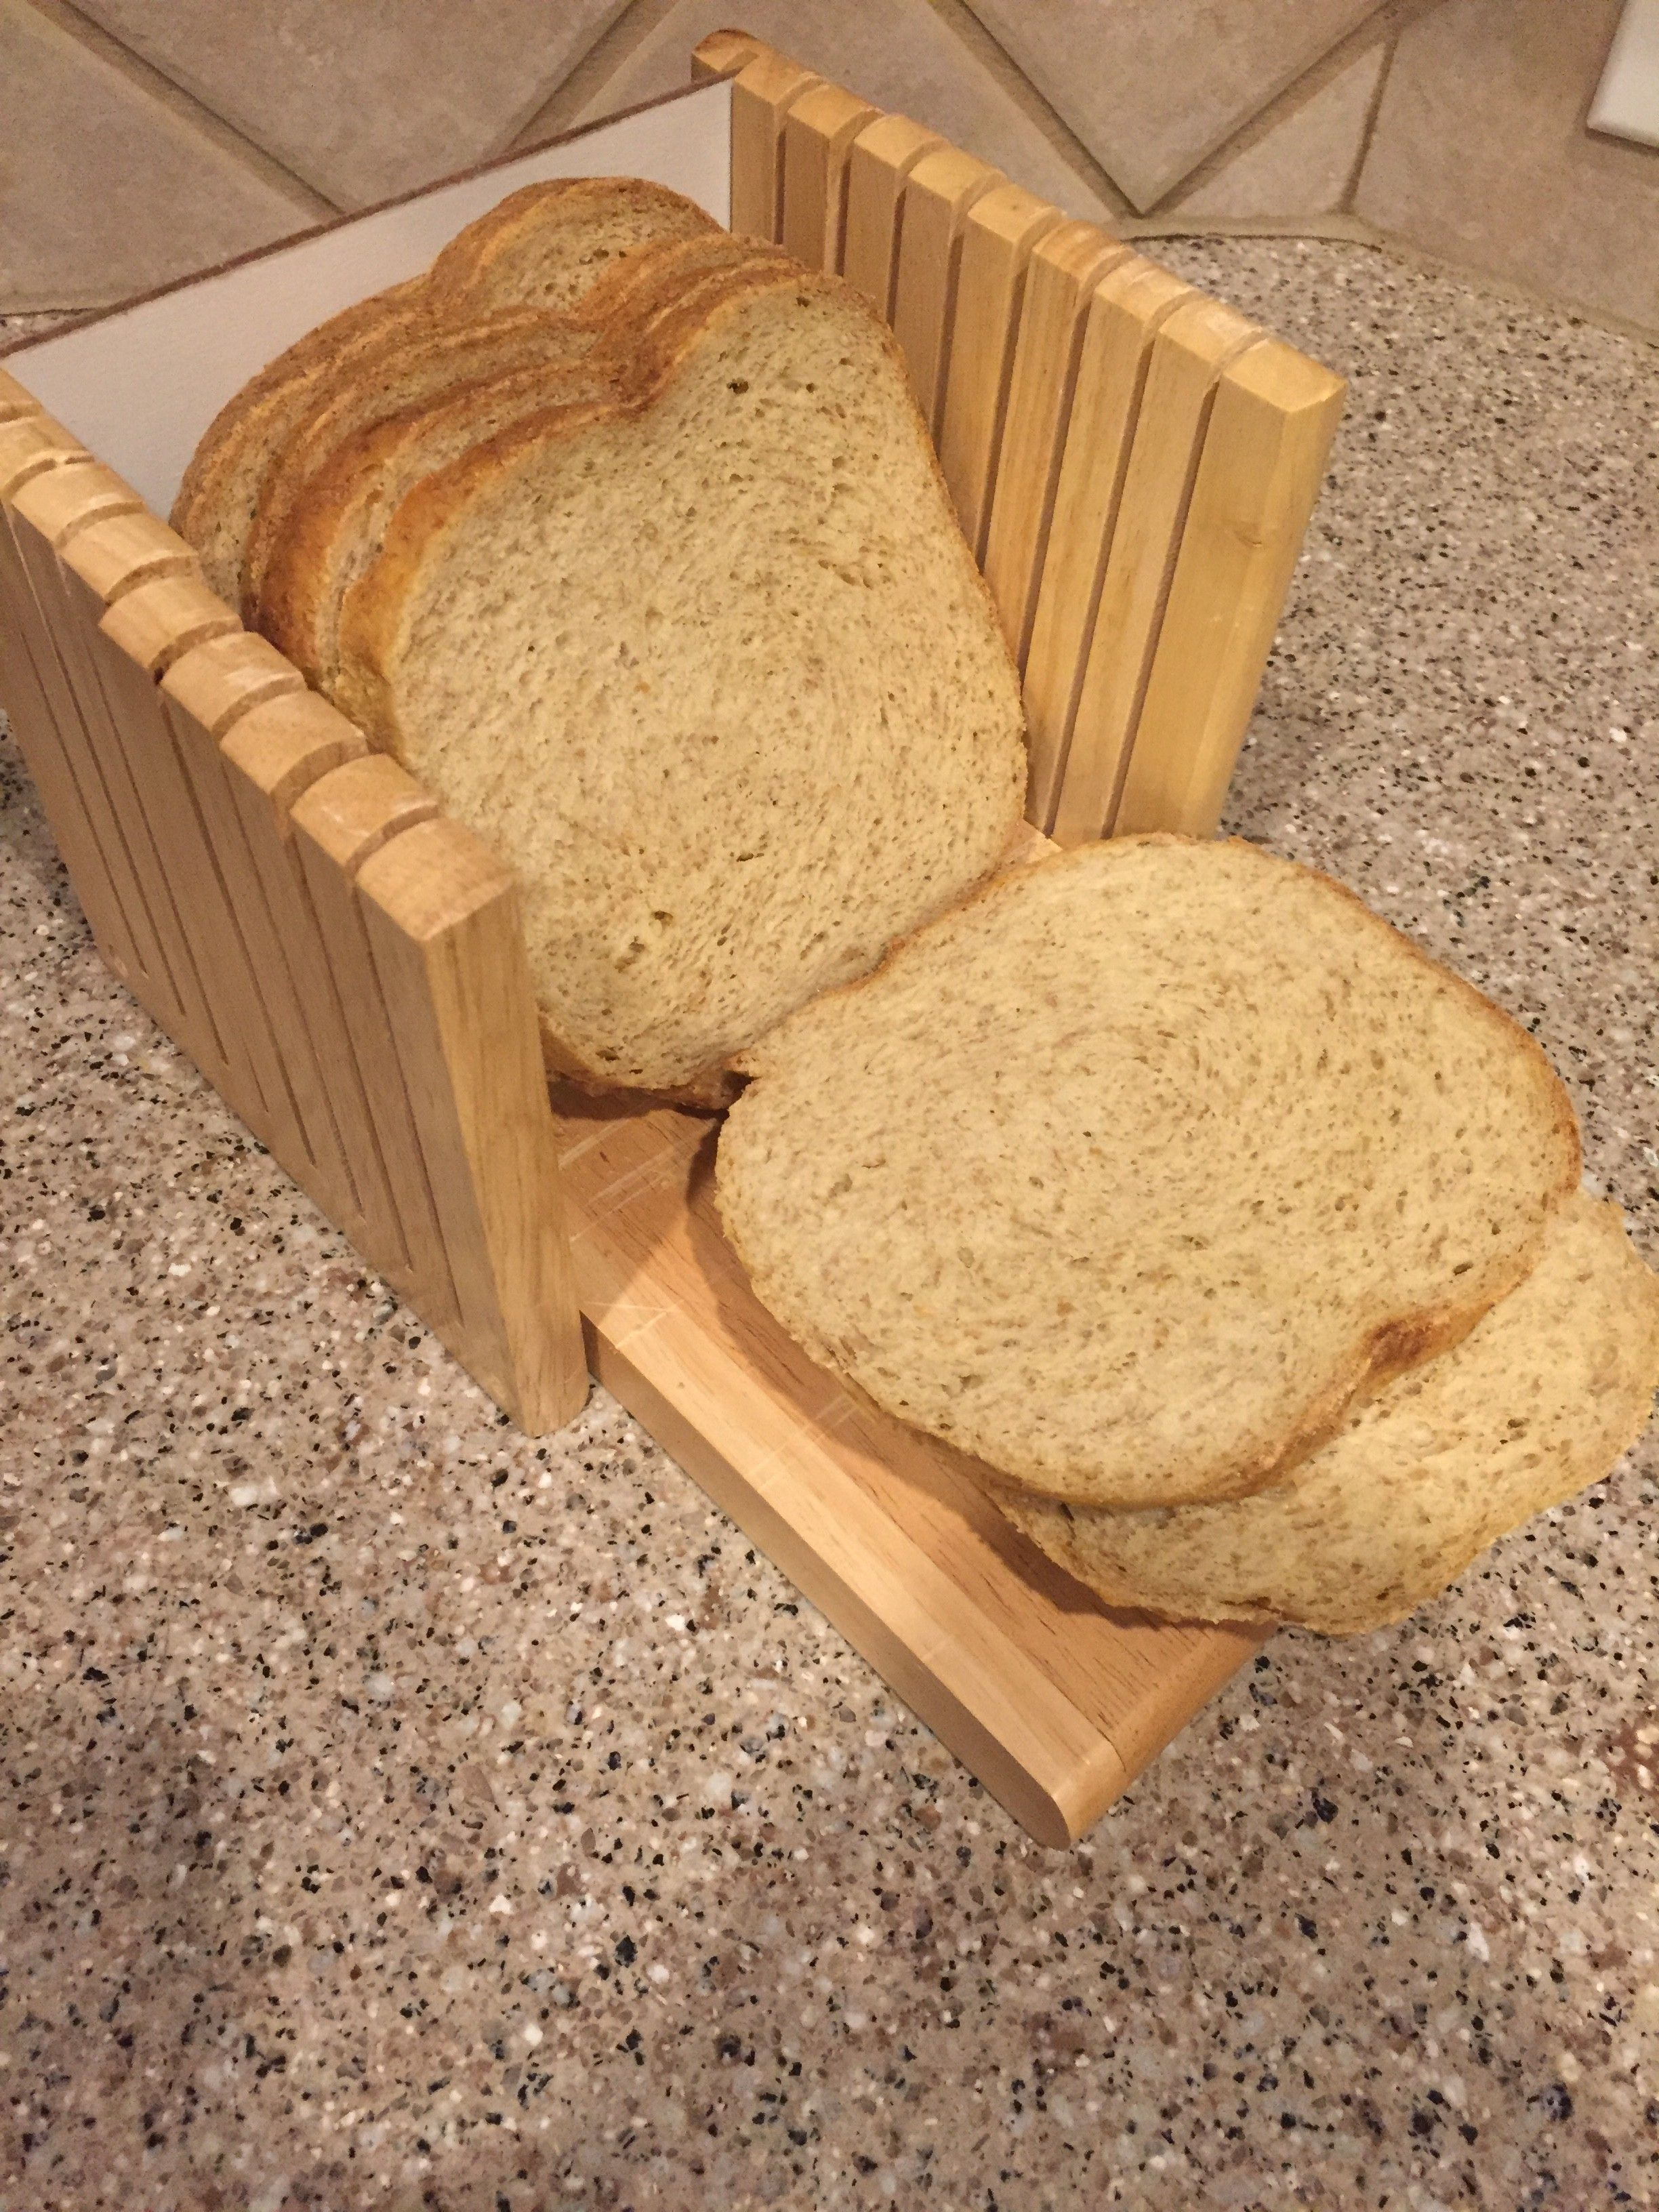 Diedre S Low Carb Yeast Bread Bread Machine Recipe In 2020